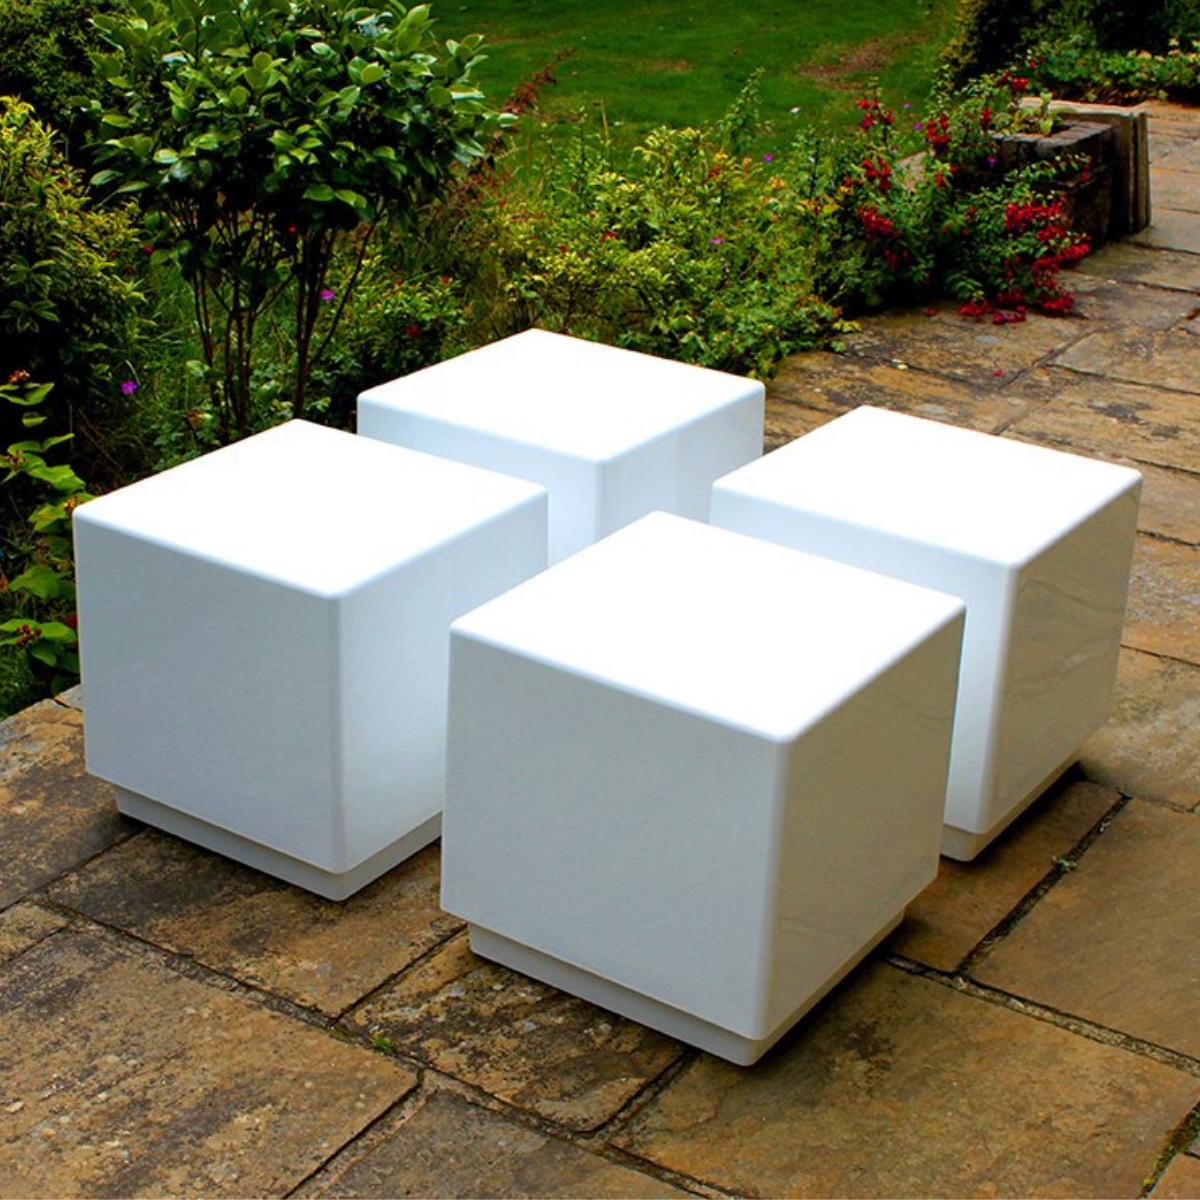 Cube Modular Seats & Tables